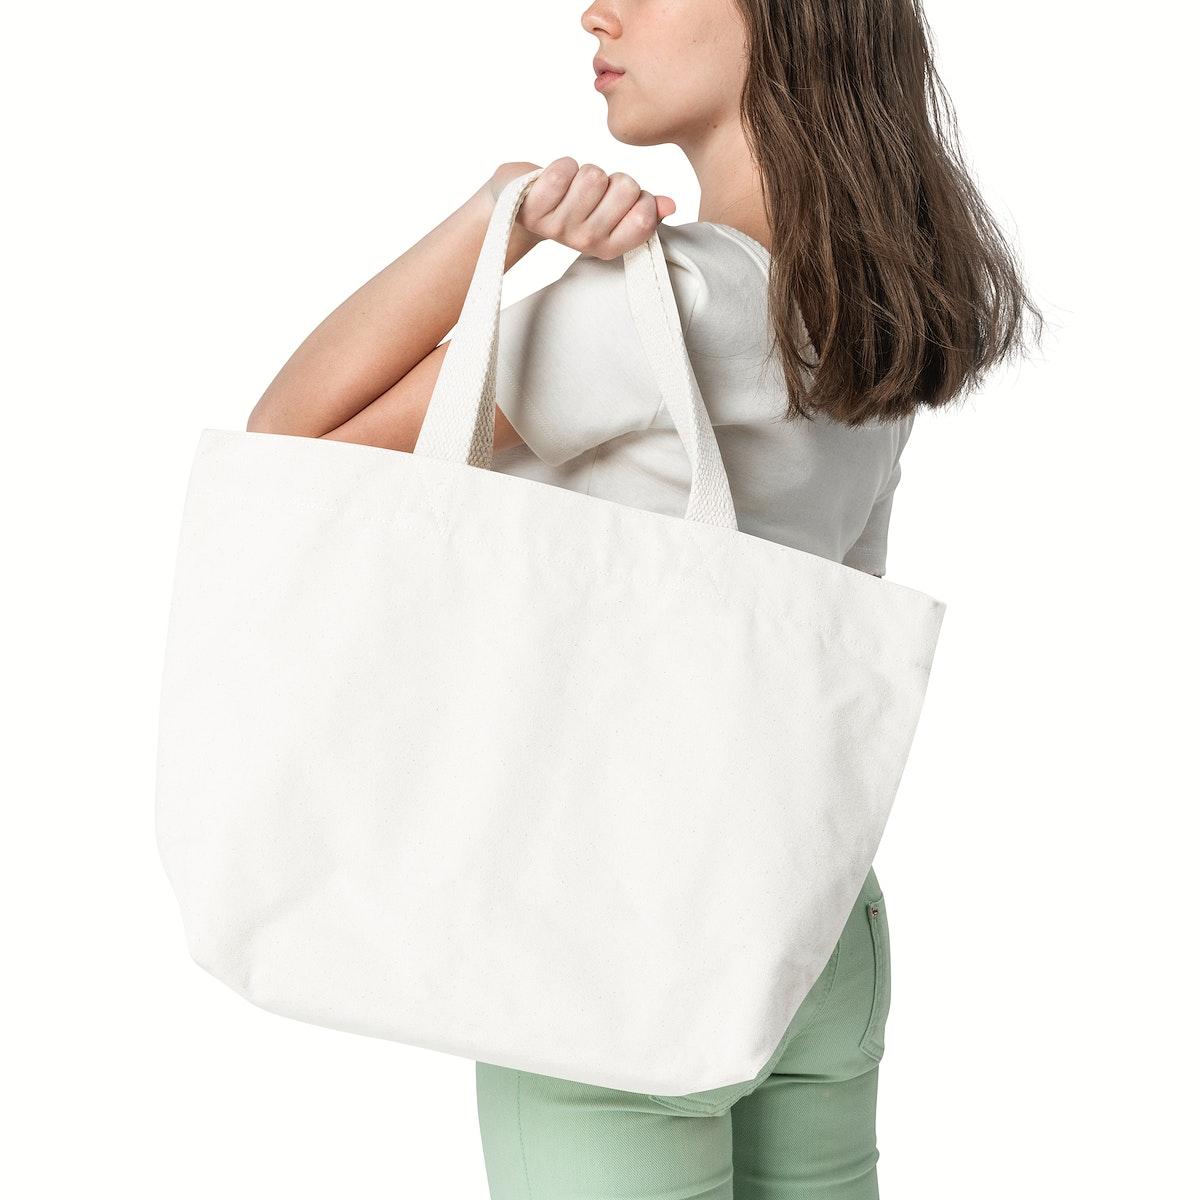 Beige tote bag psd mockup in canvas design apparel shoot